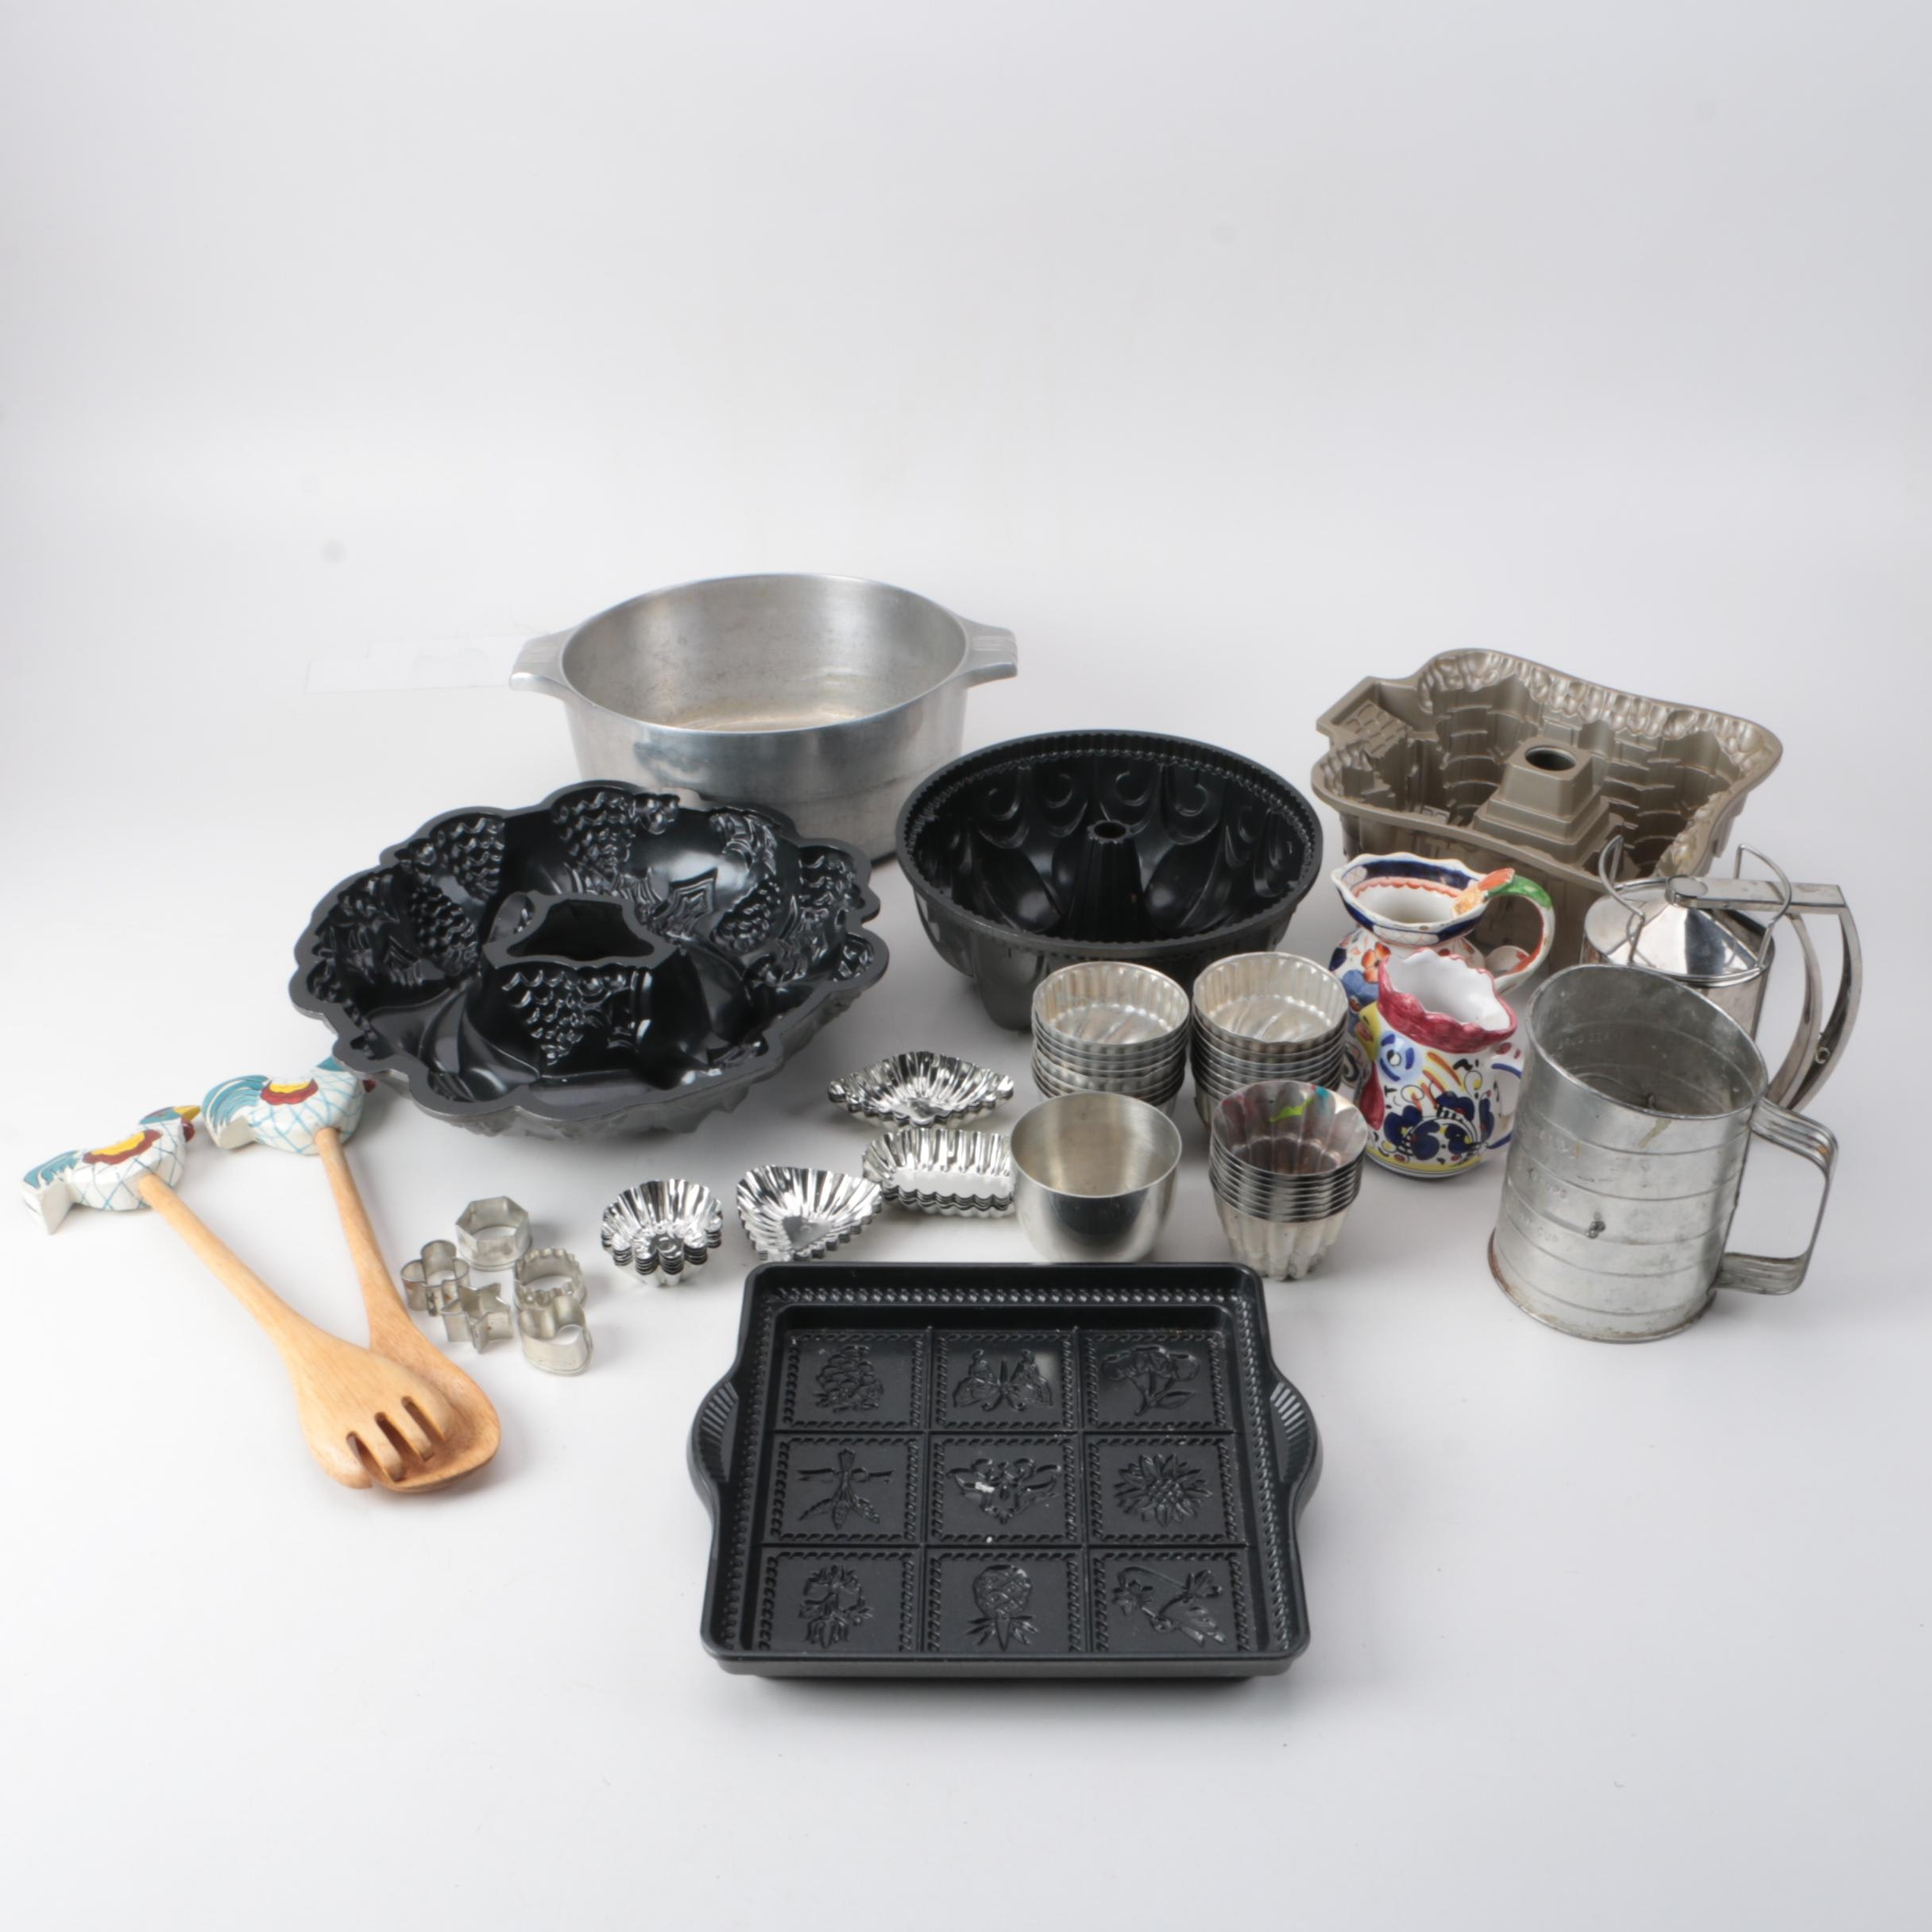 Bakeware Including Italian Ceramic, Cake Molds and Ironstone Creamer